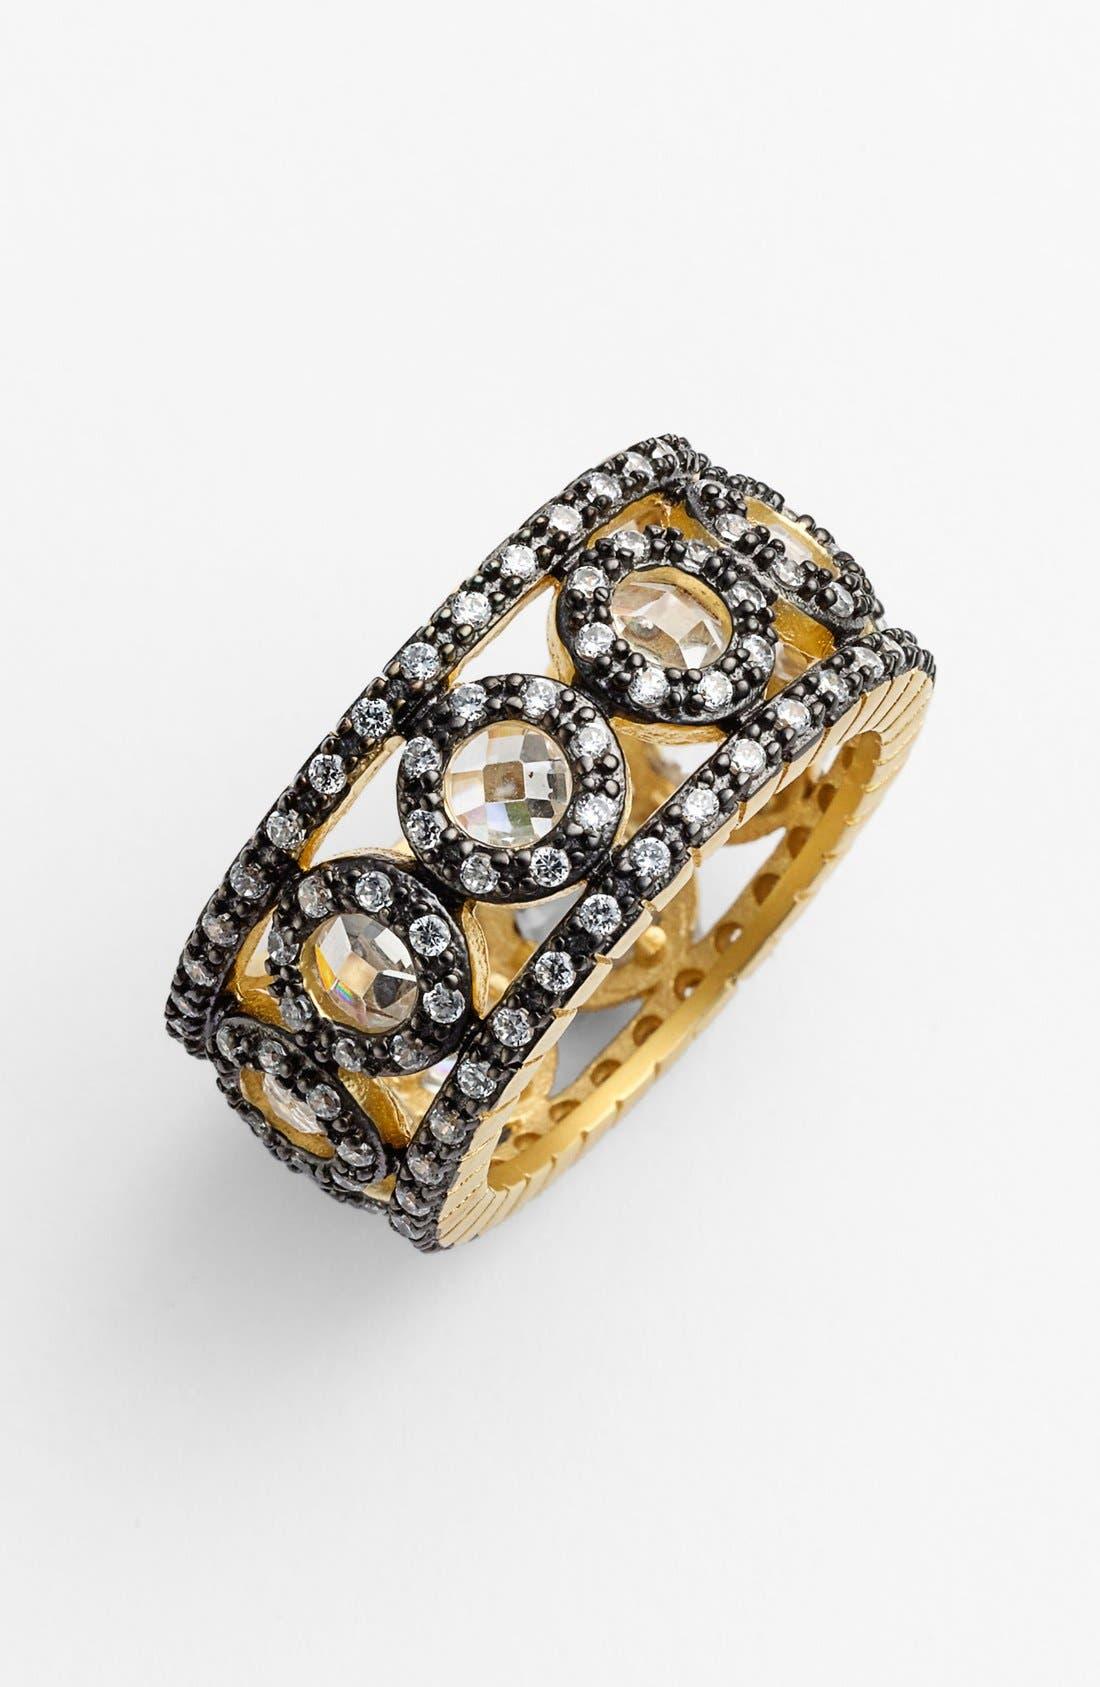 Main Image - FREIDA ROTHMAN 'Classics - Kaleidoscope' Ring